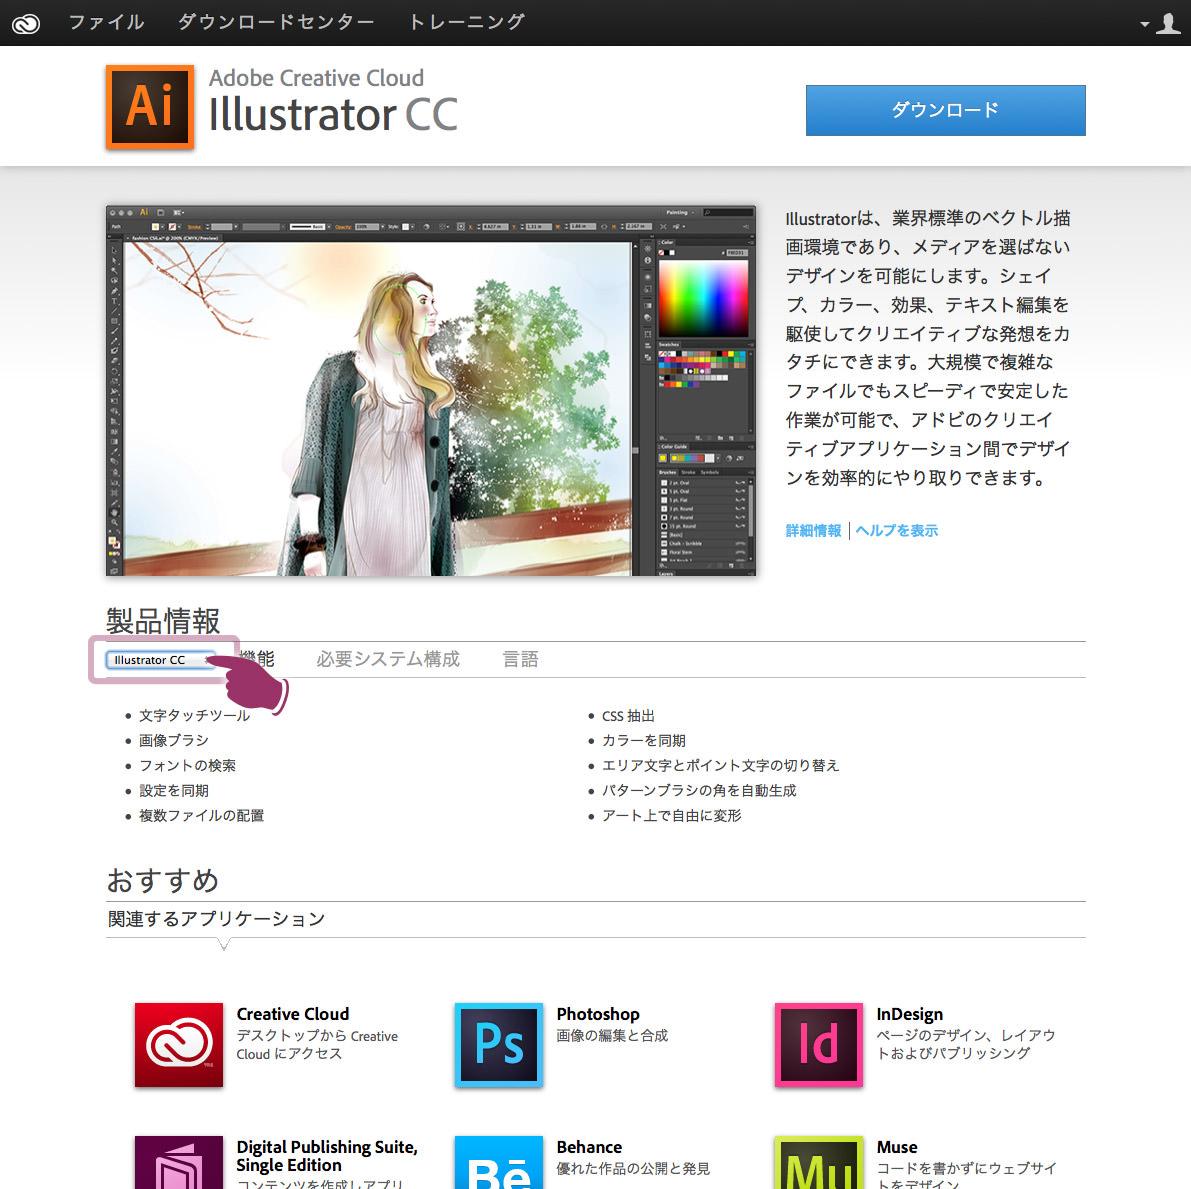 CS6-download-center-3.jpg